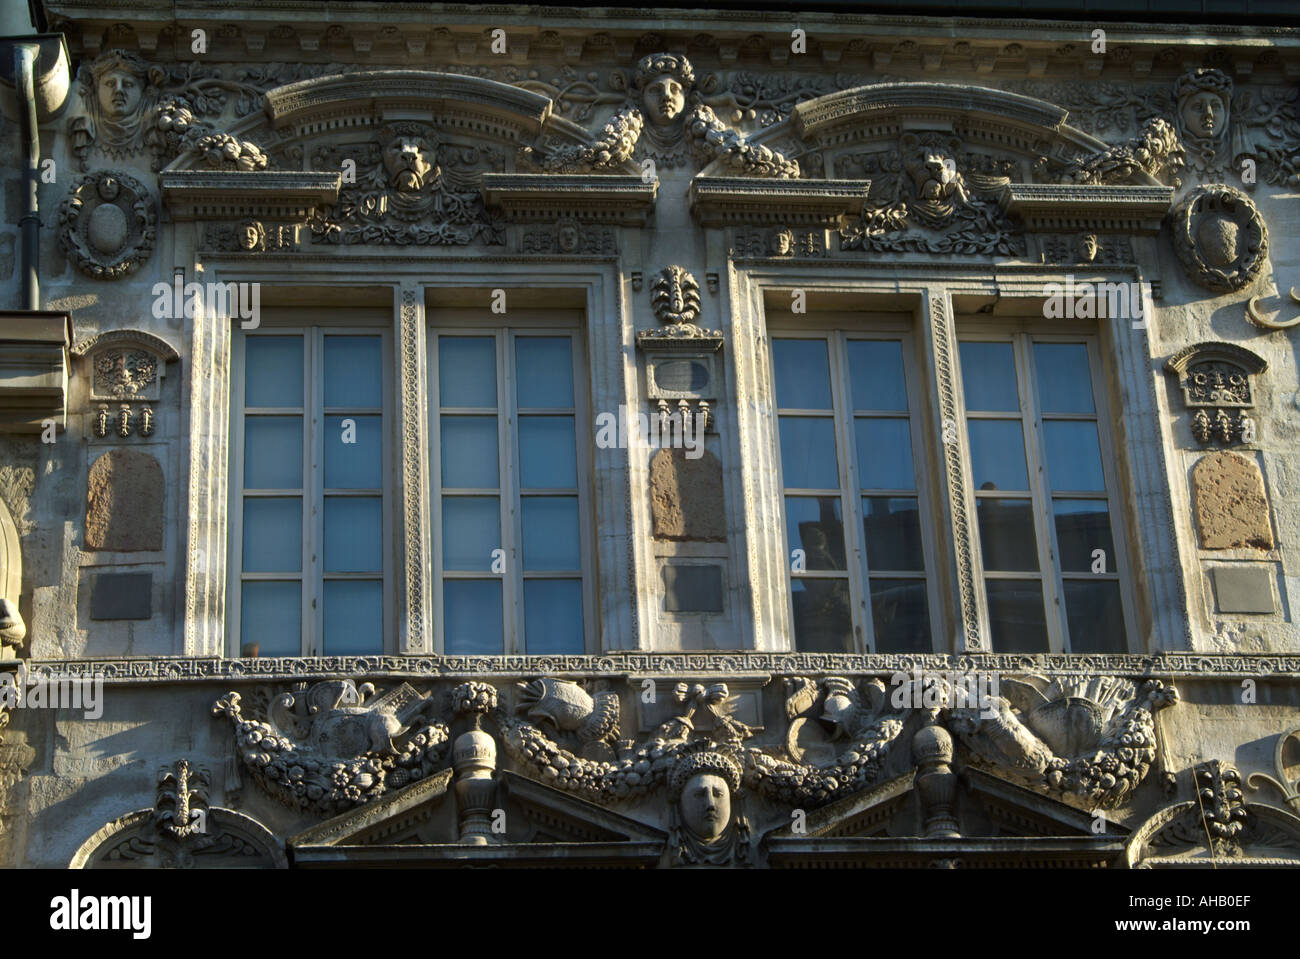 France Cote d Or Dijon elaborate building decoration Stock Photo